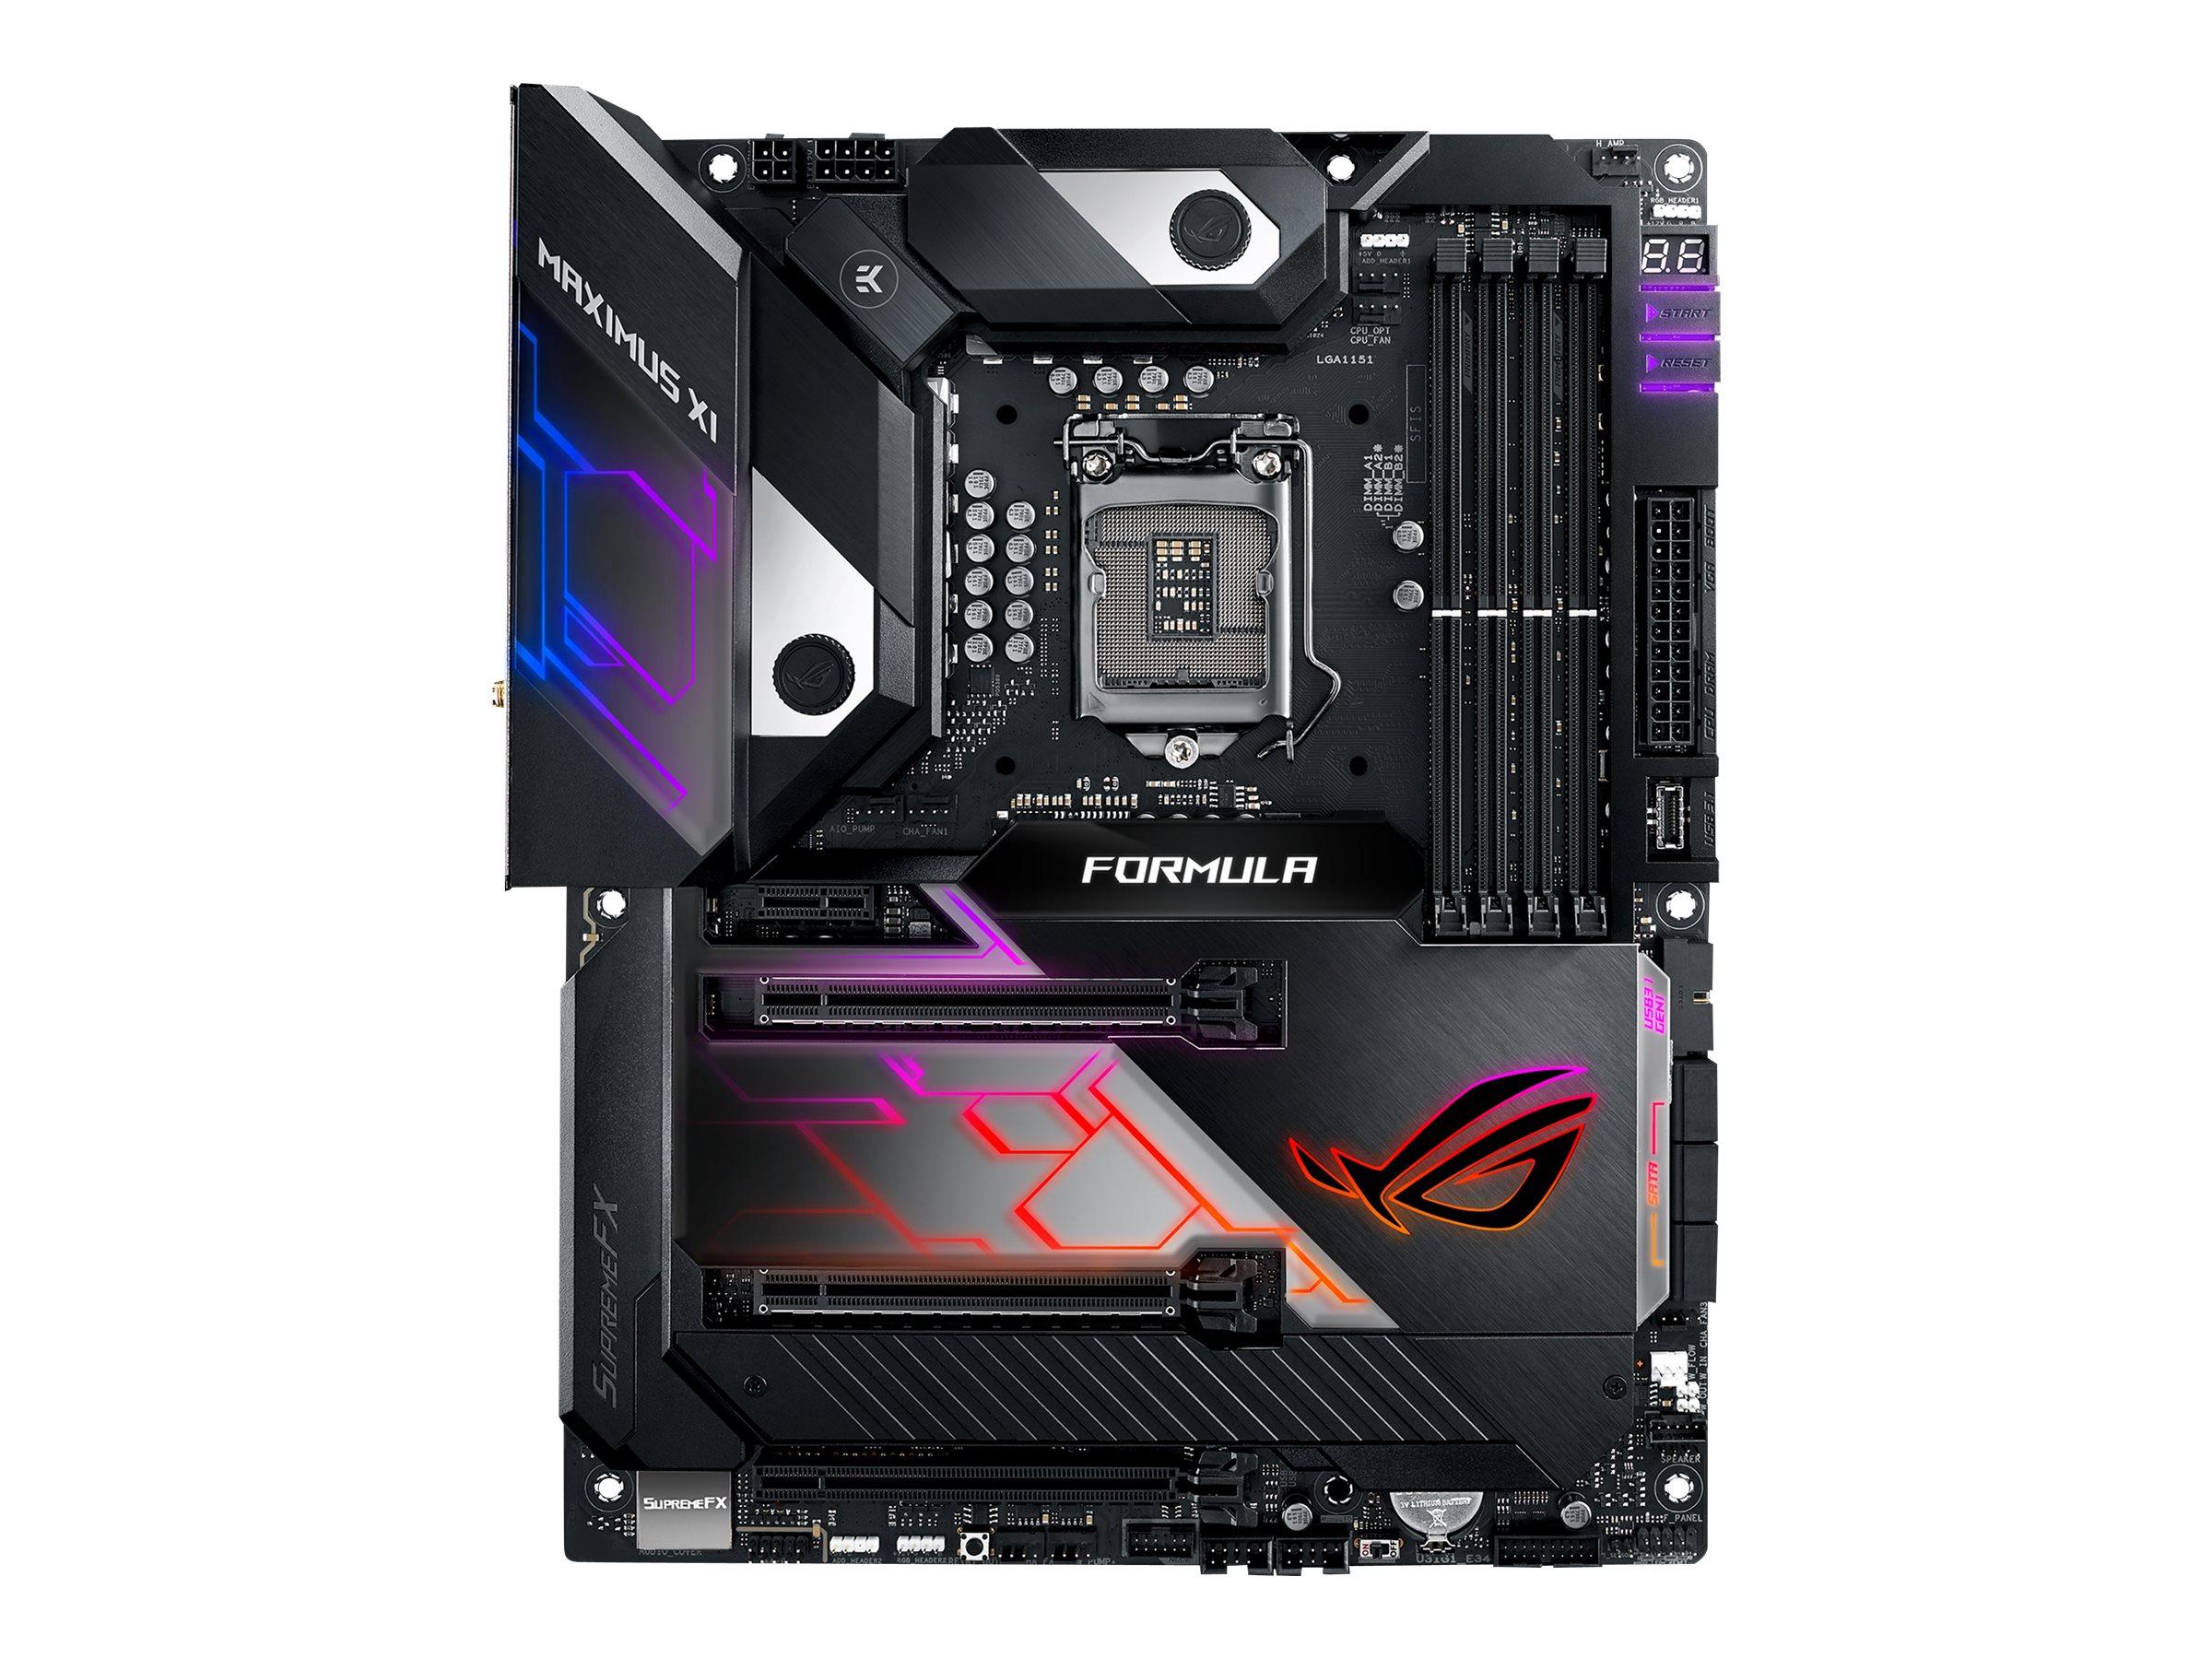 ASUS ROG MAXIMUS XI FORMULA - Motherboard - ATX - LGA1151 Socket - Z390 - USB 3.1 Gen 1, USB-C Gen2, USB 3.1 Gen 2